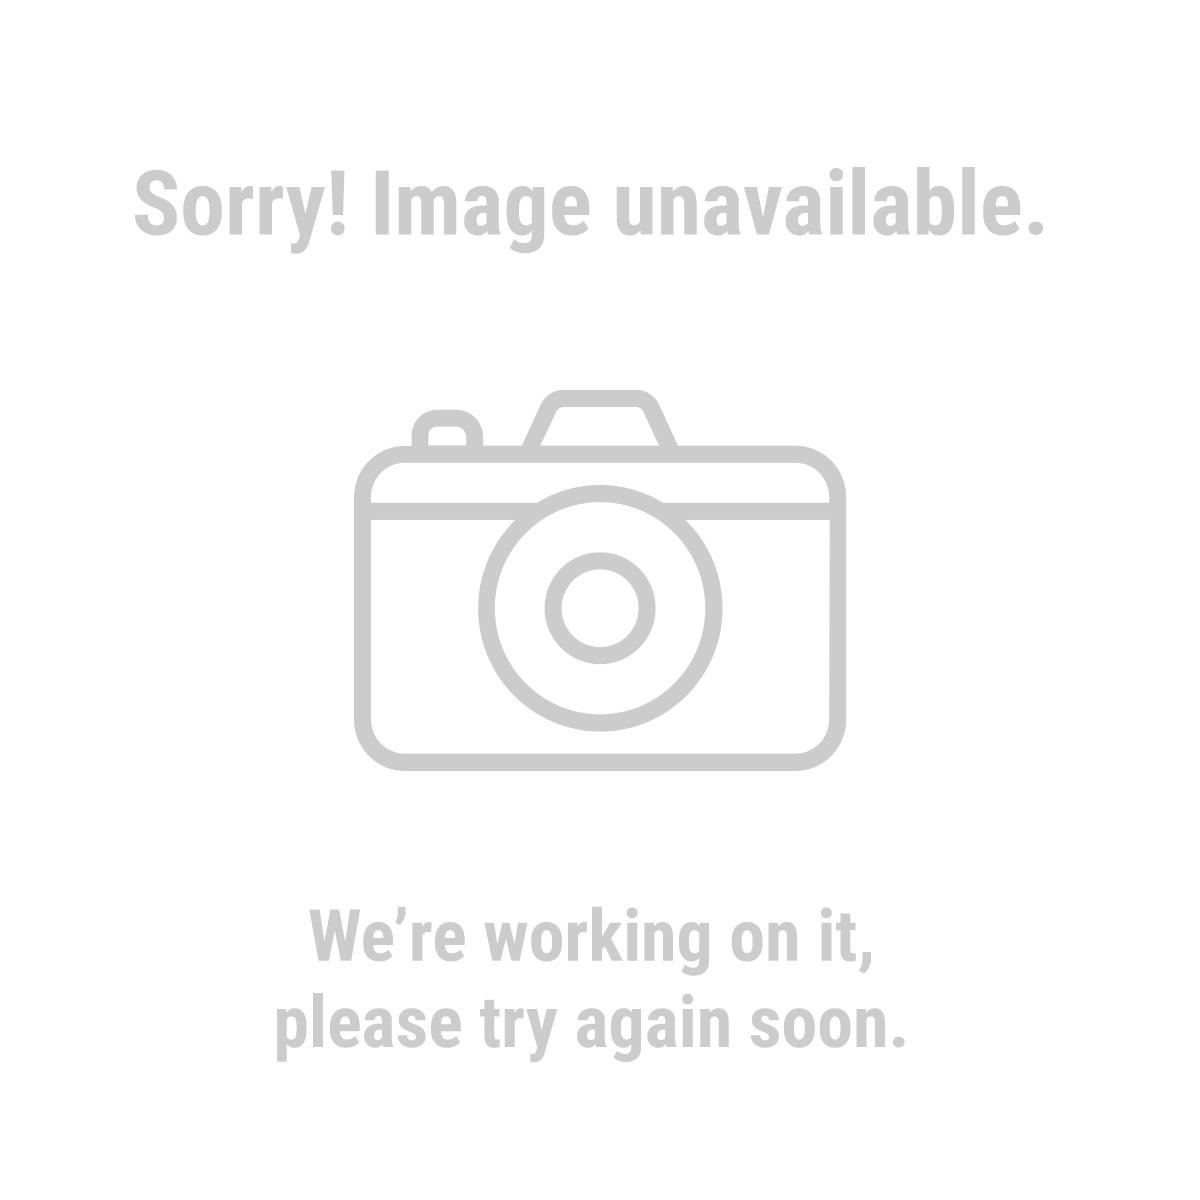 Storehouse® 63035 30 In. x 16 In. Two Shelf Polypropylene Industrial Service Cart